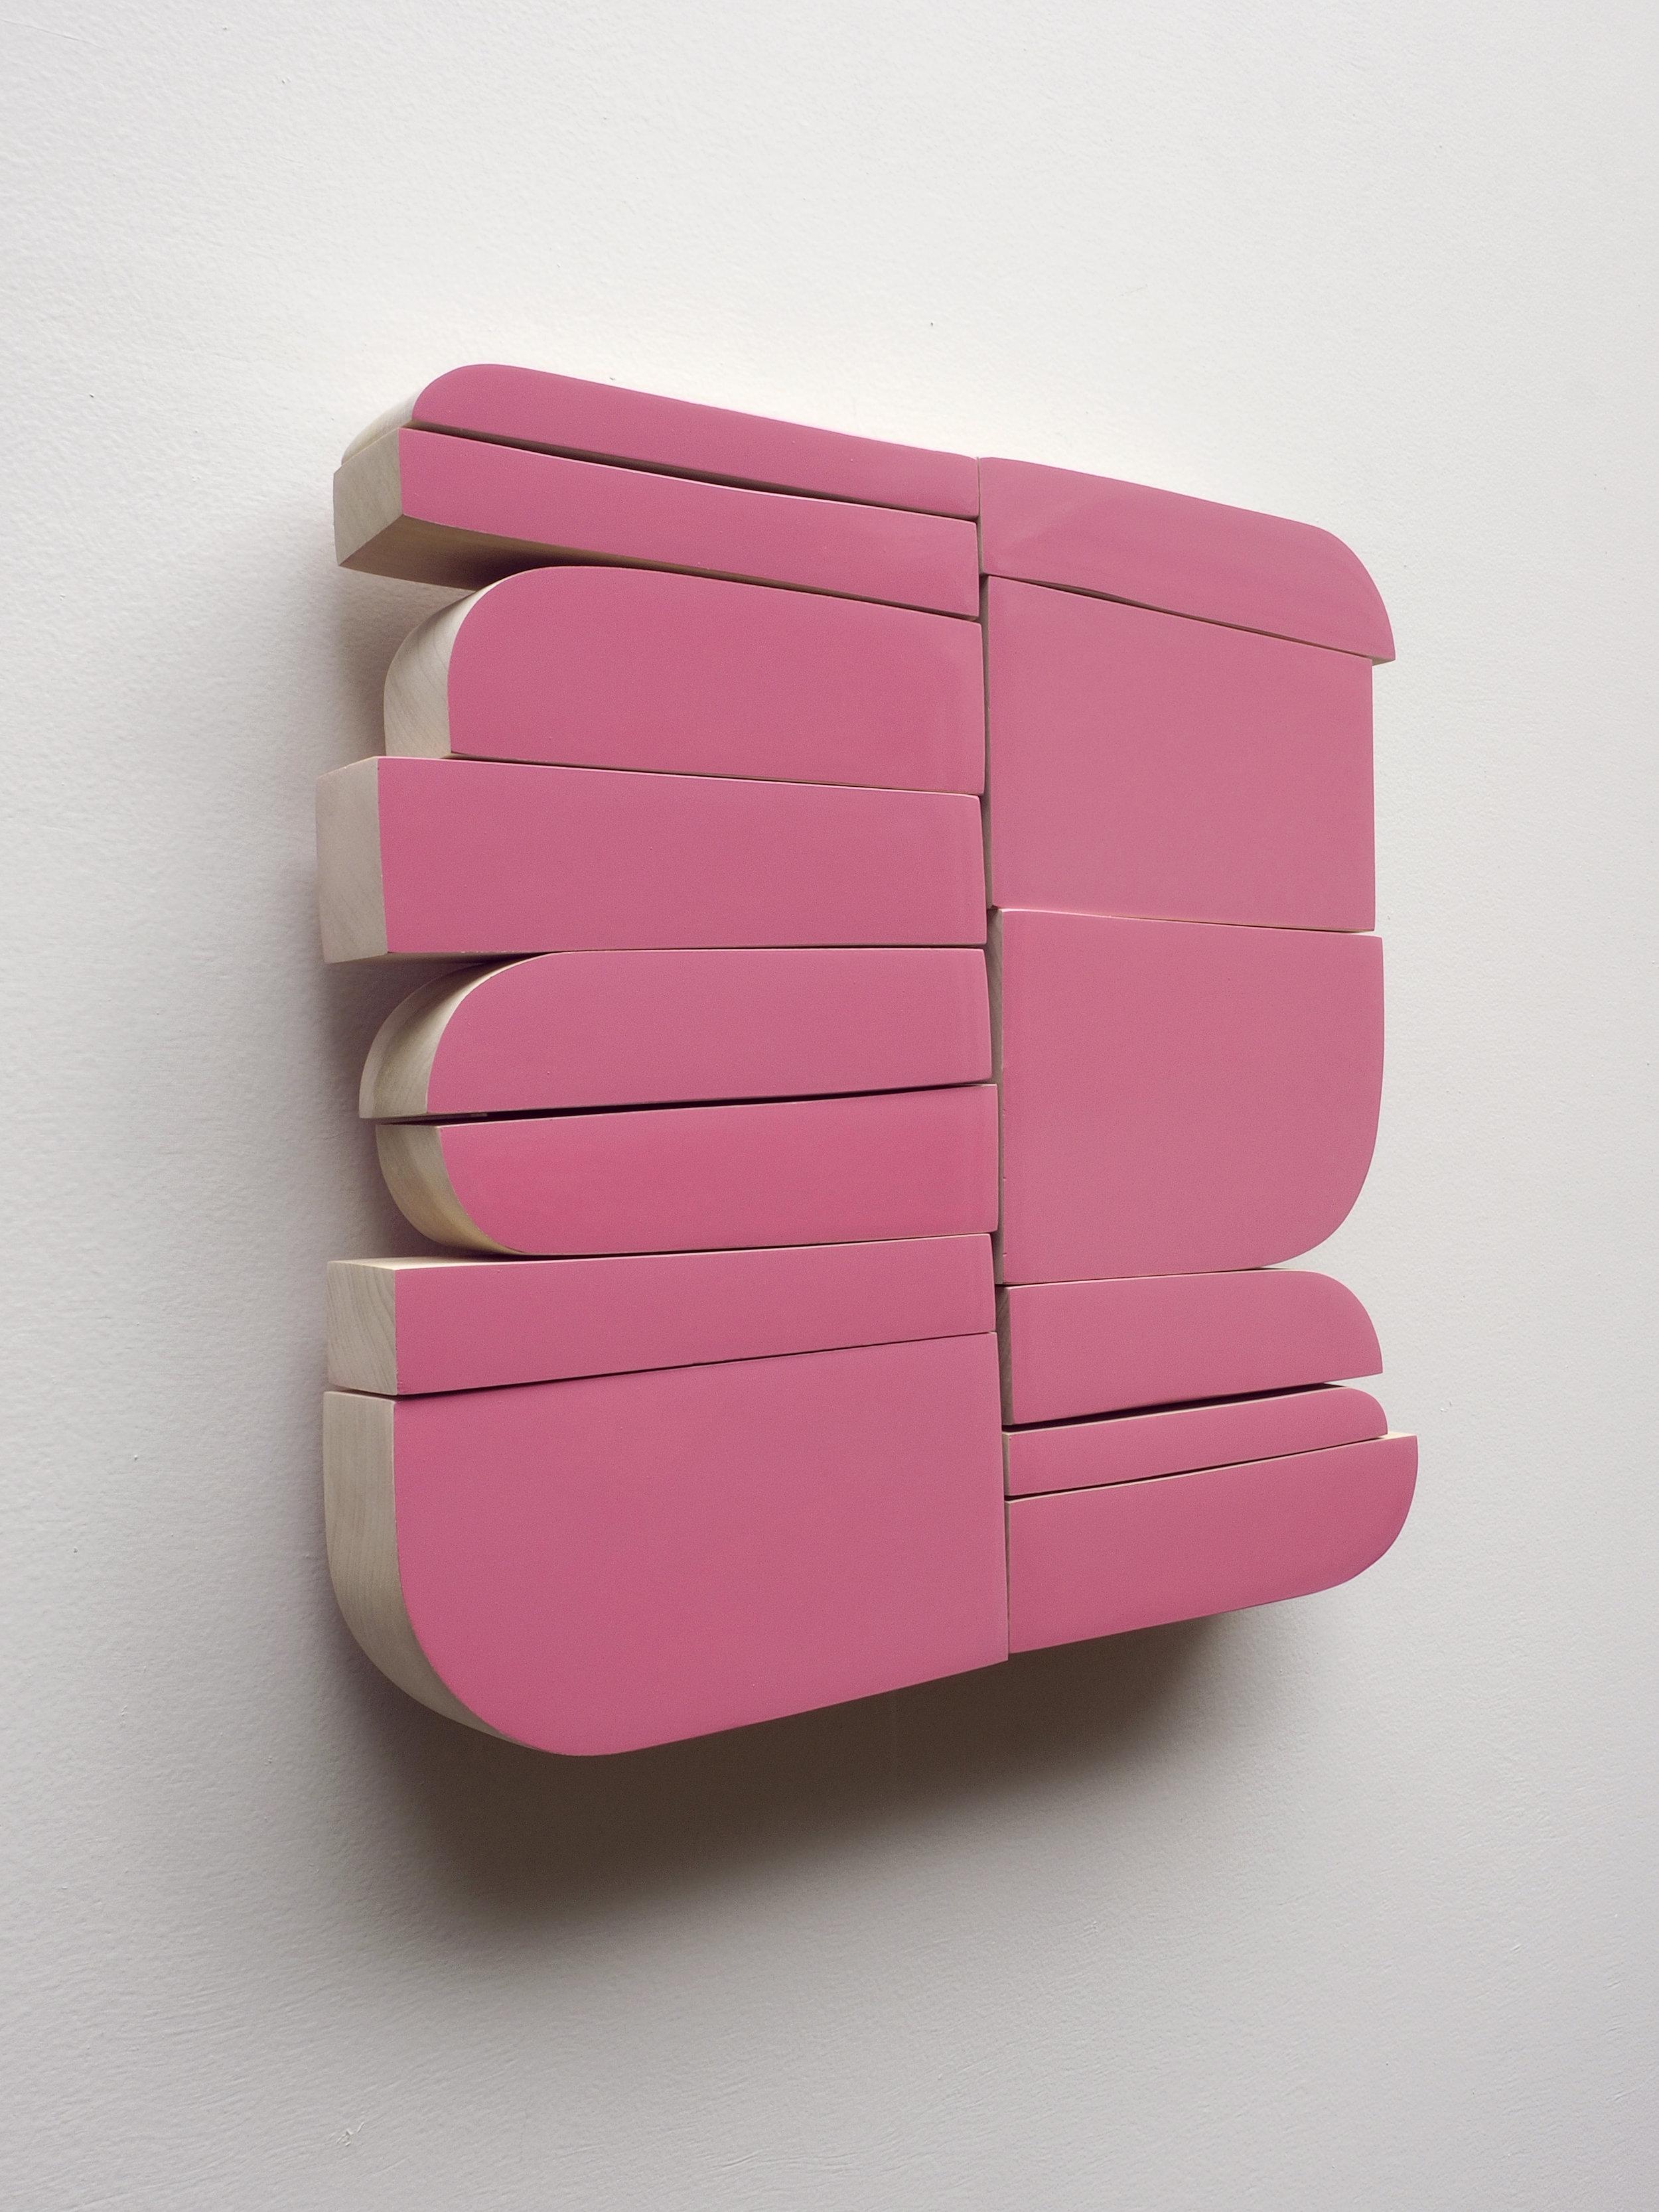 zimmerman2017-pinkFlamingo.jpg